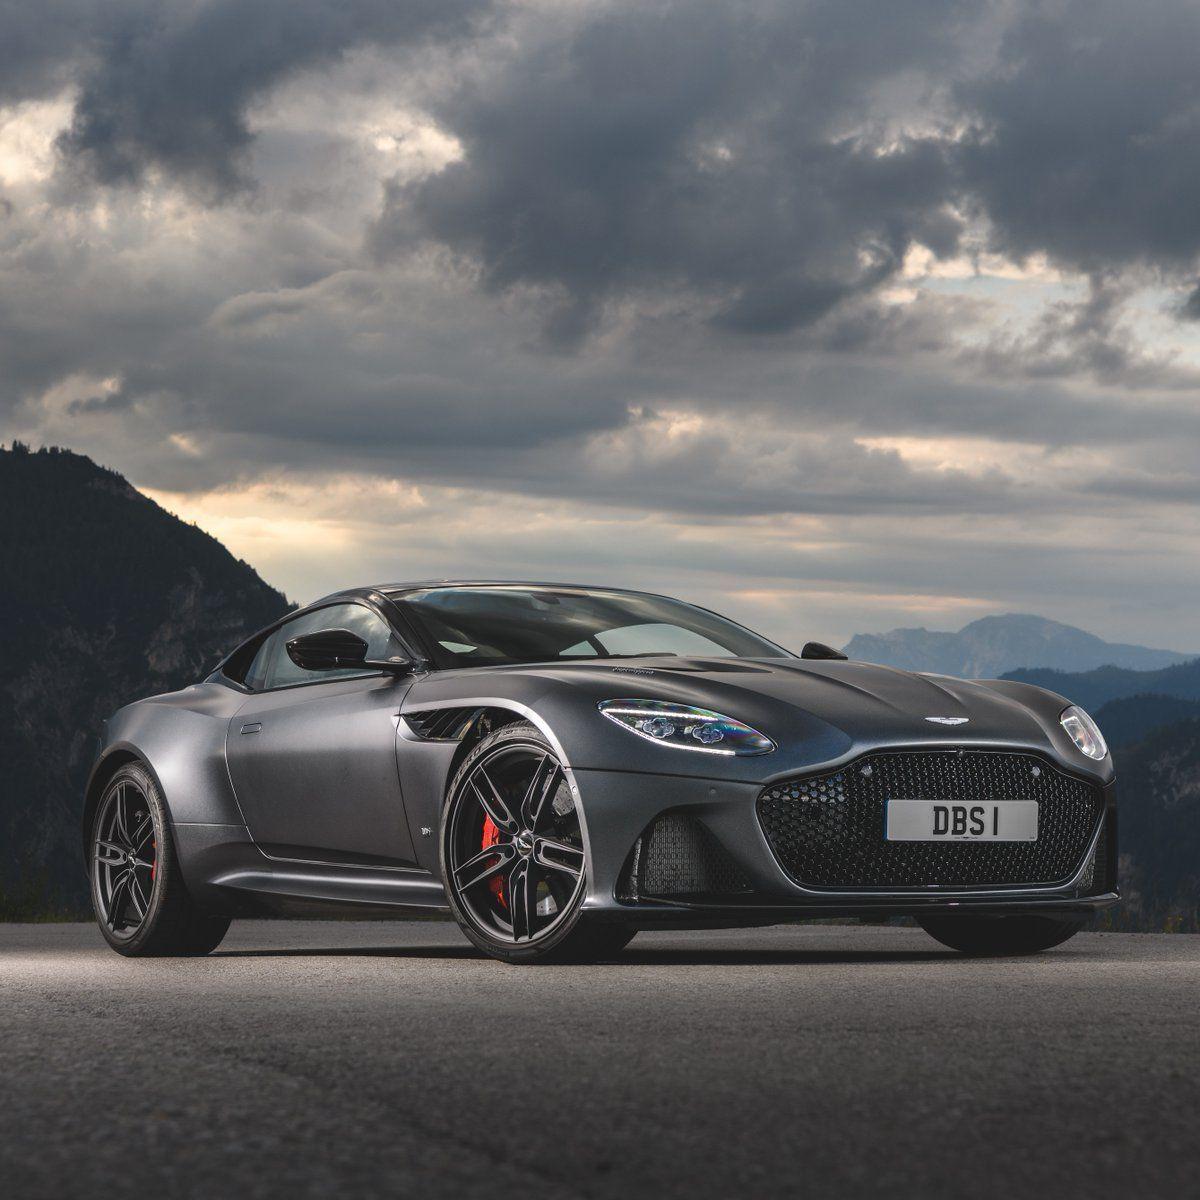 4 Aston Martins Will Co Star In James Bond Movie No Time To Die